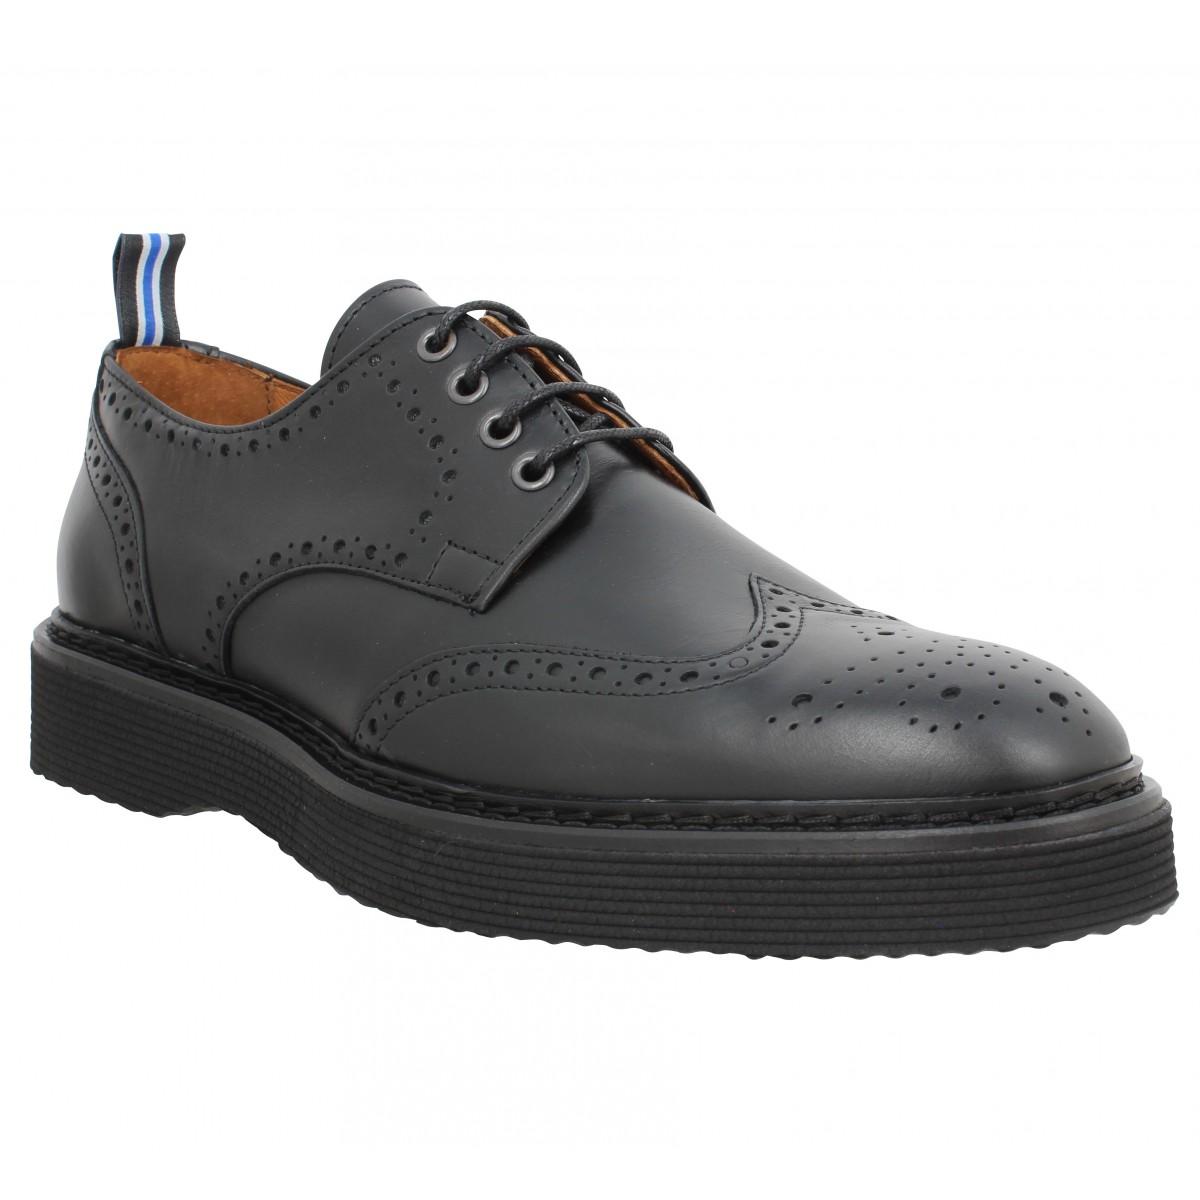 Chaussures à lacets SCHMOOVE Roma Perfo cuir Homme Noir